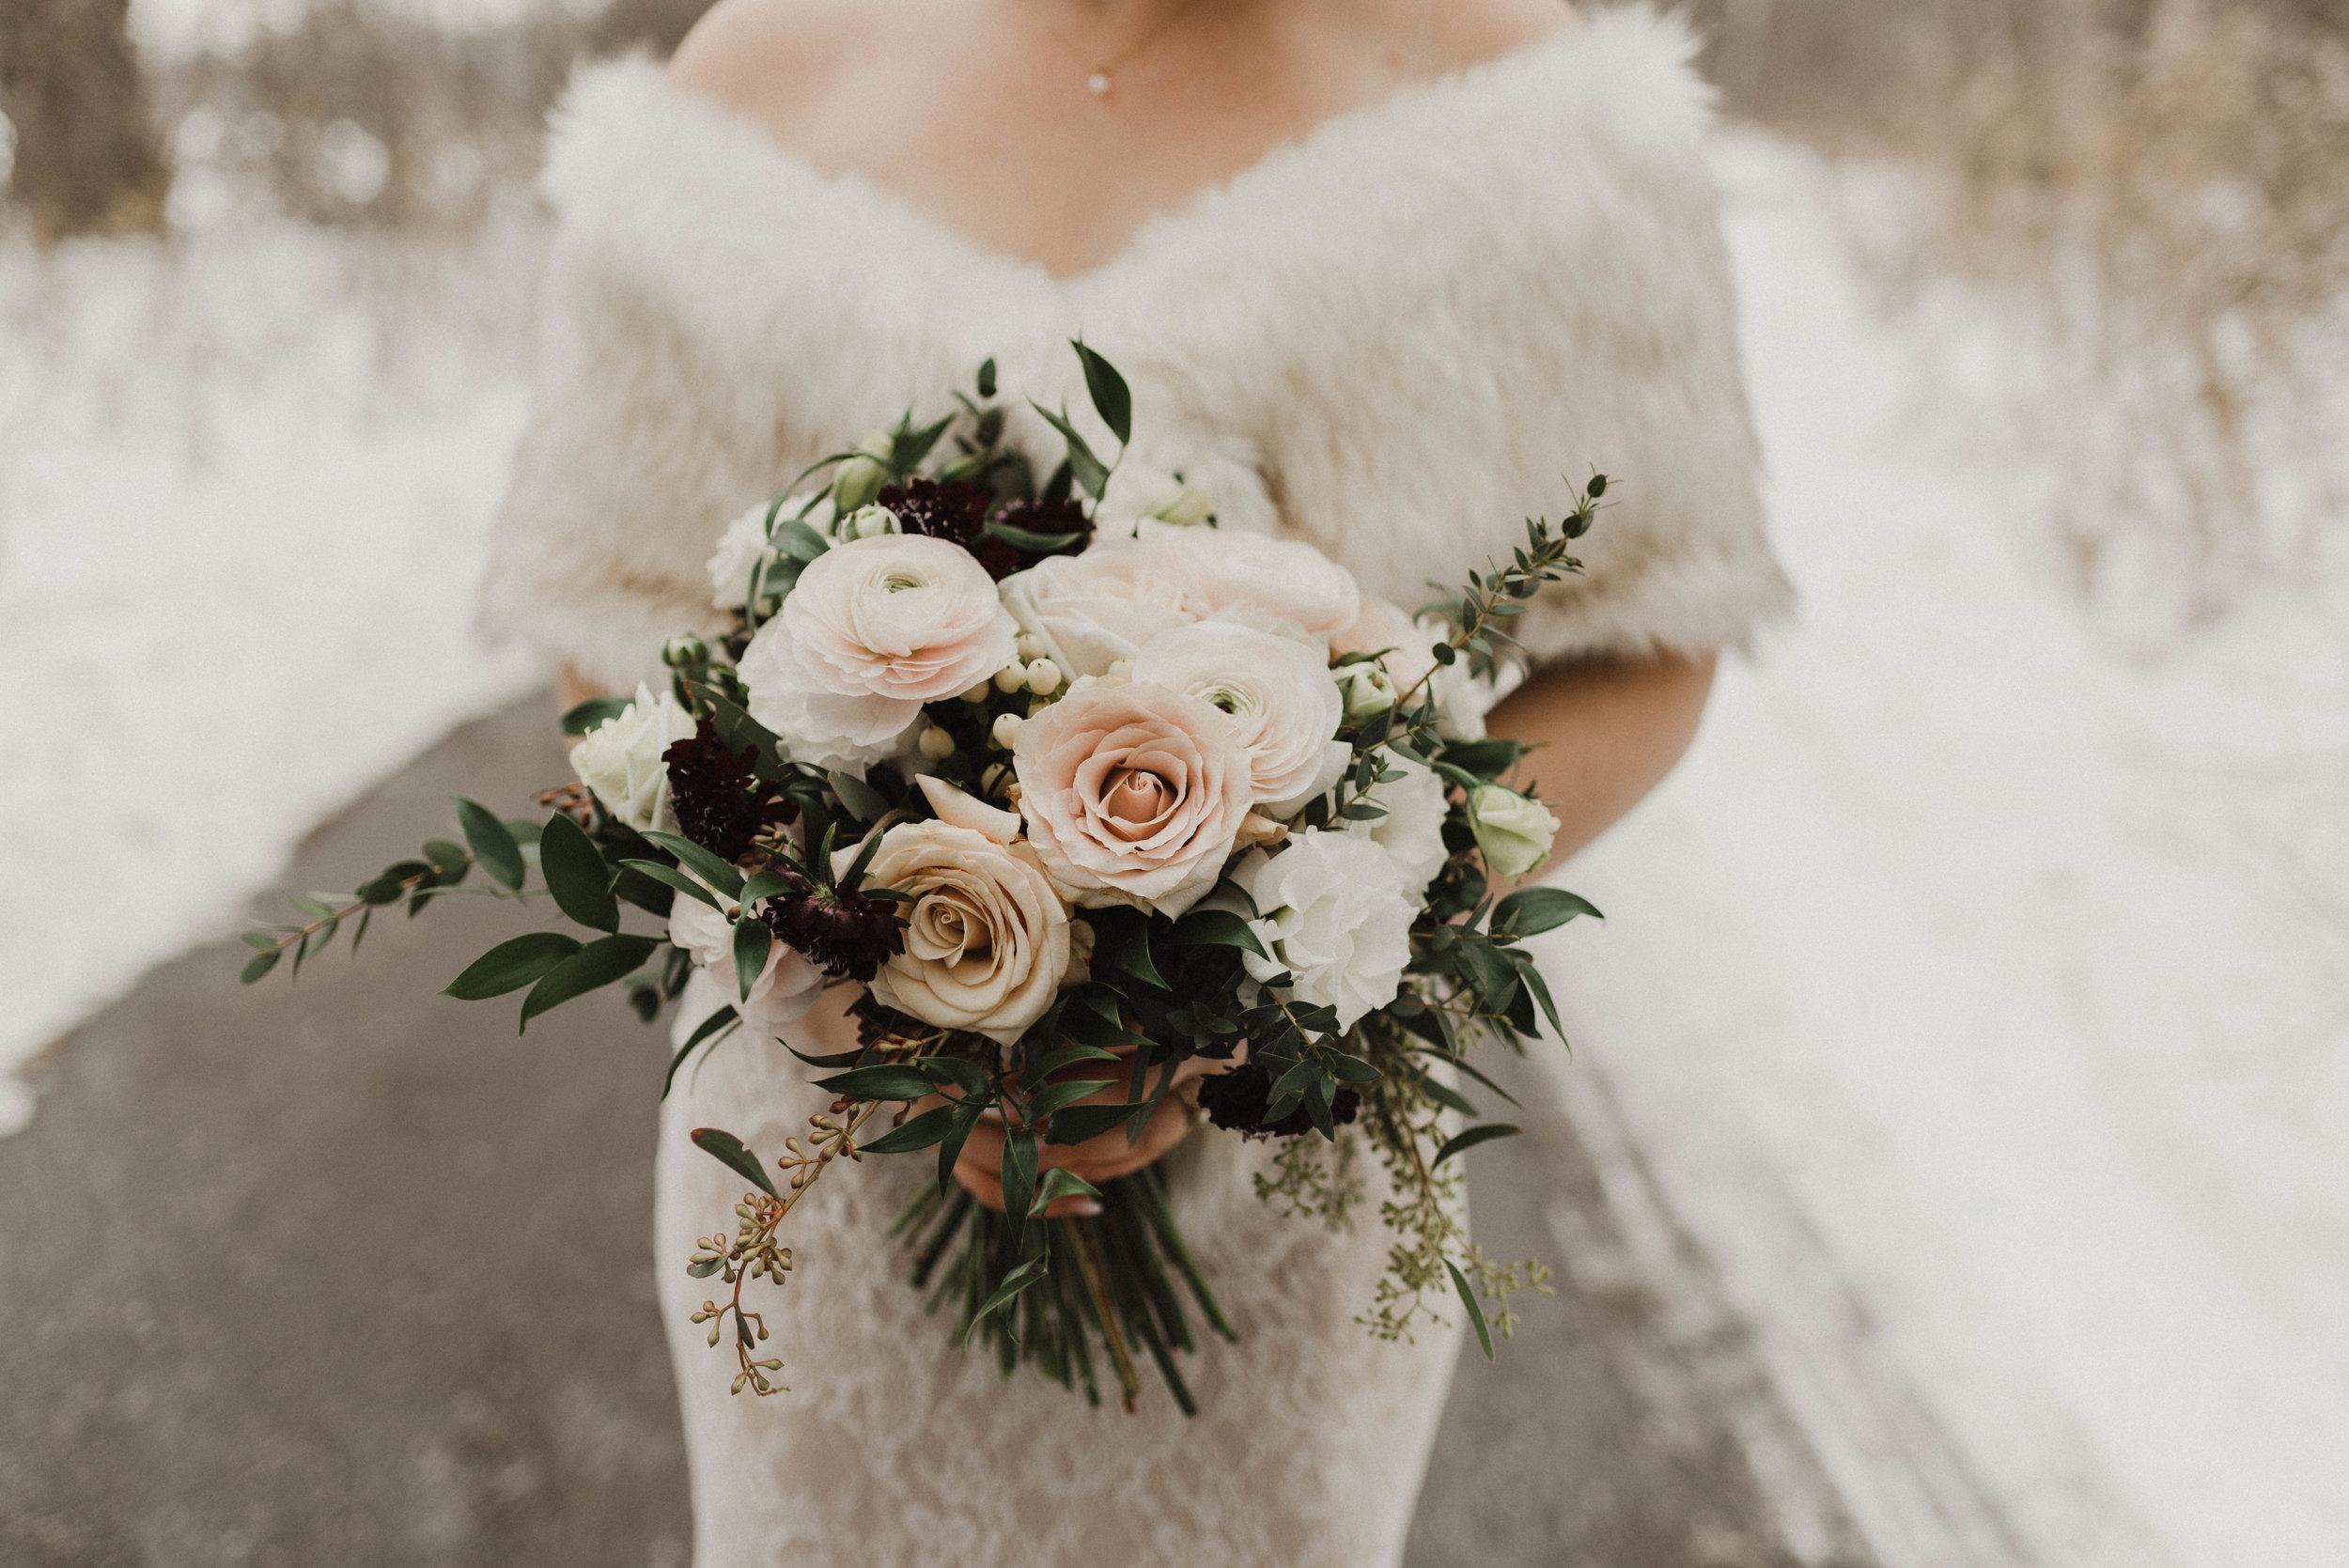 Elegant bridal bouquet for Canadian winter wedding.